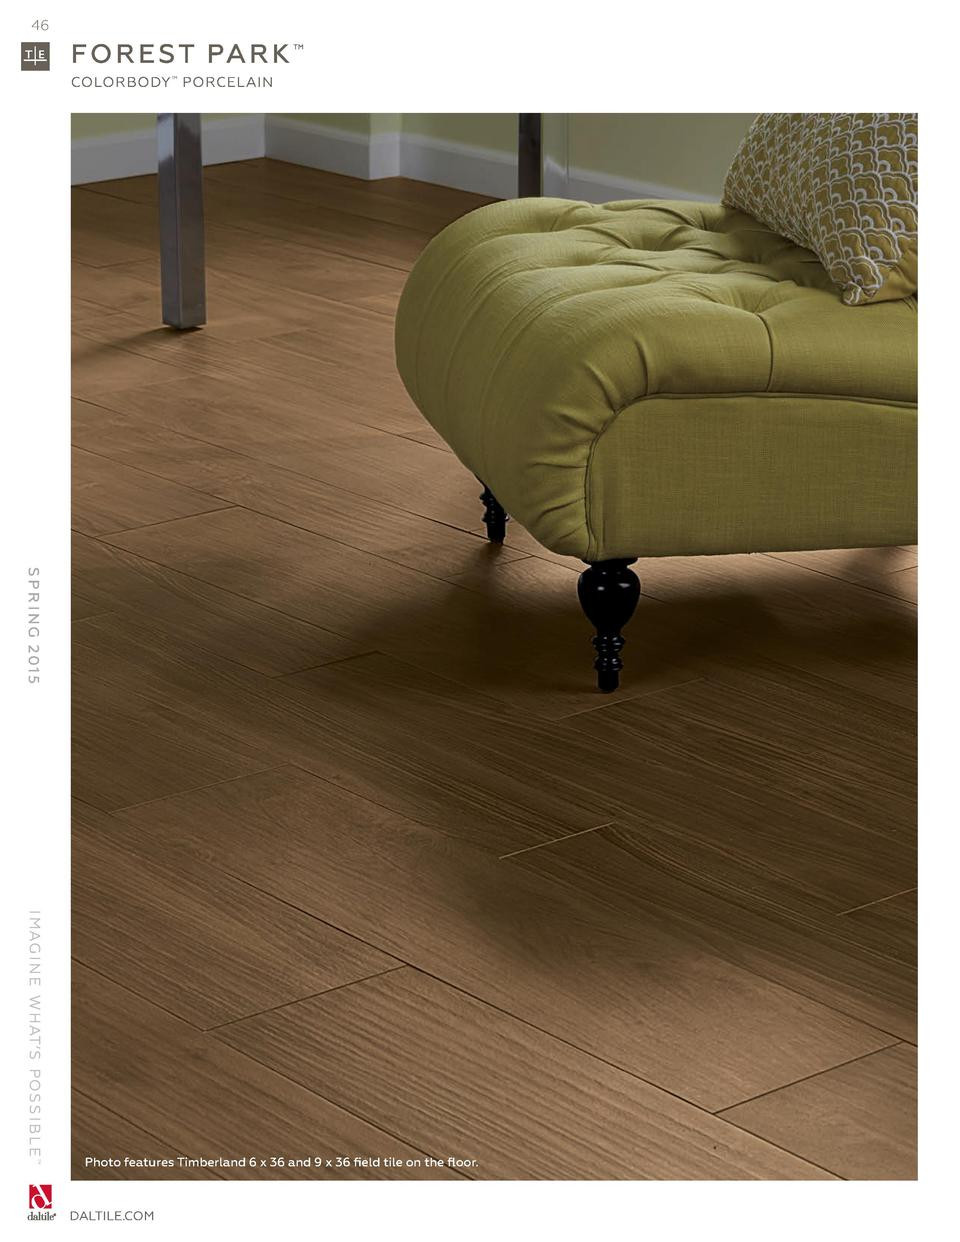 speckled elm hardwood flooring of daltile spring 2015 catalog simplebooklet com with 46 fo r e st pa r k colorbody porcelain s p r i n g 2 01 5 i mag i n e w hat